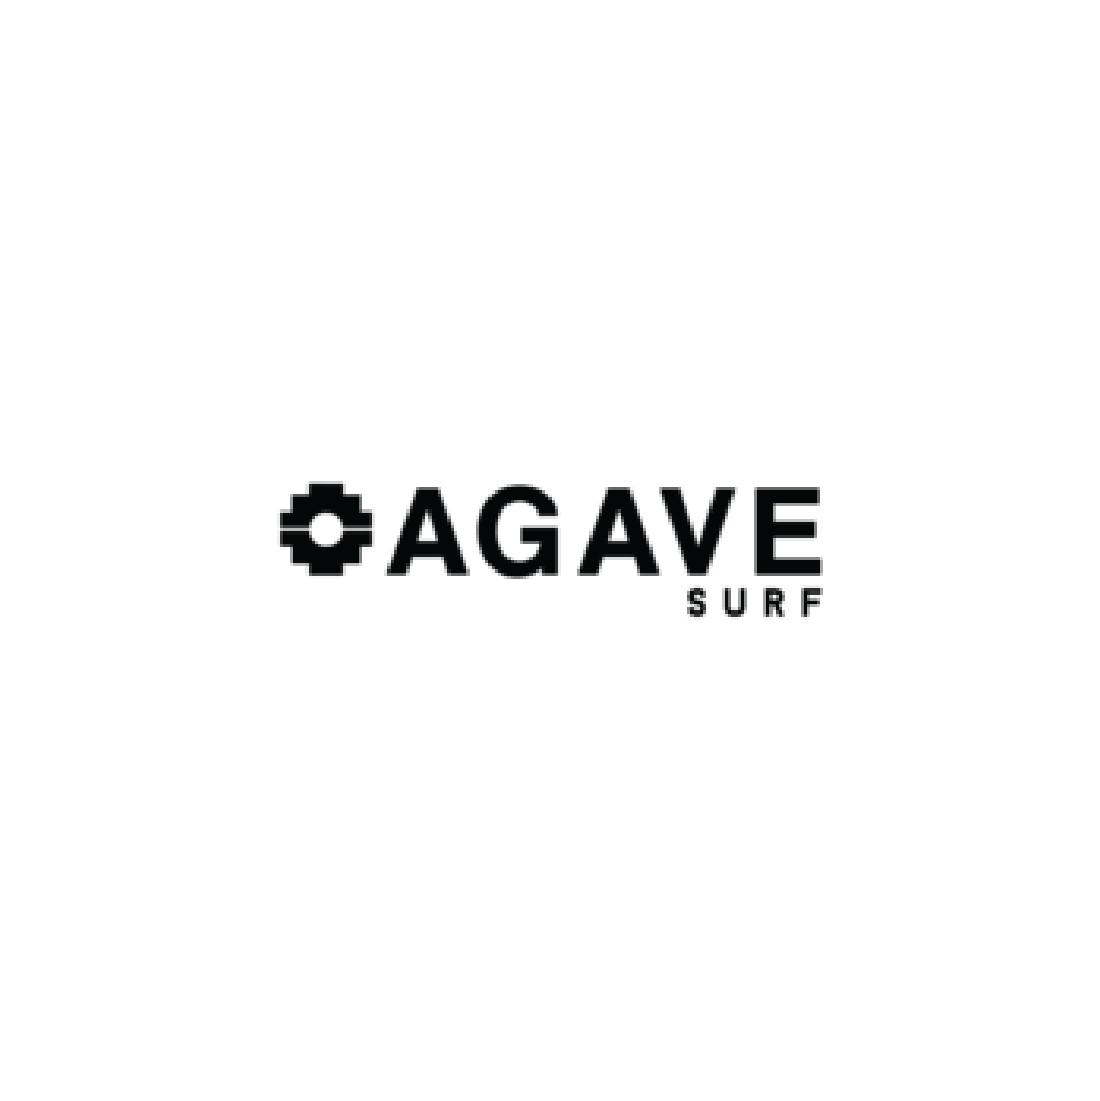 Agave Surf logo